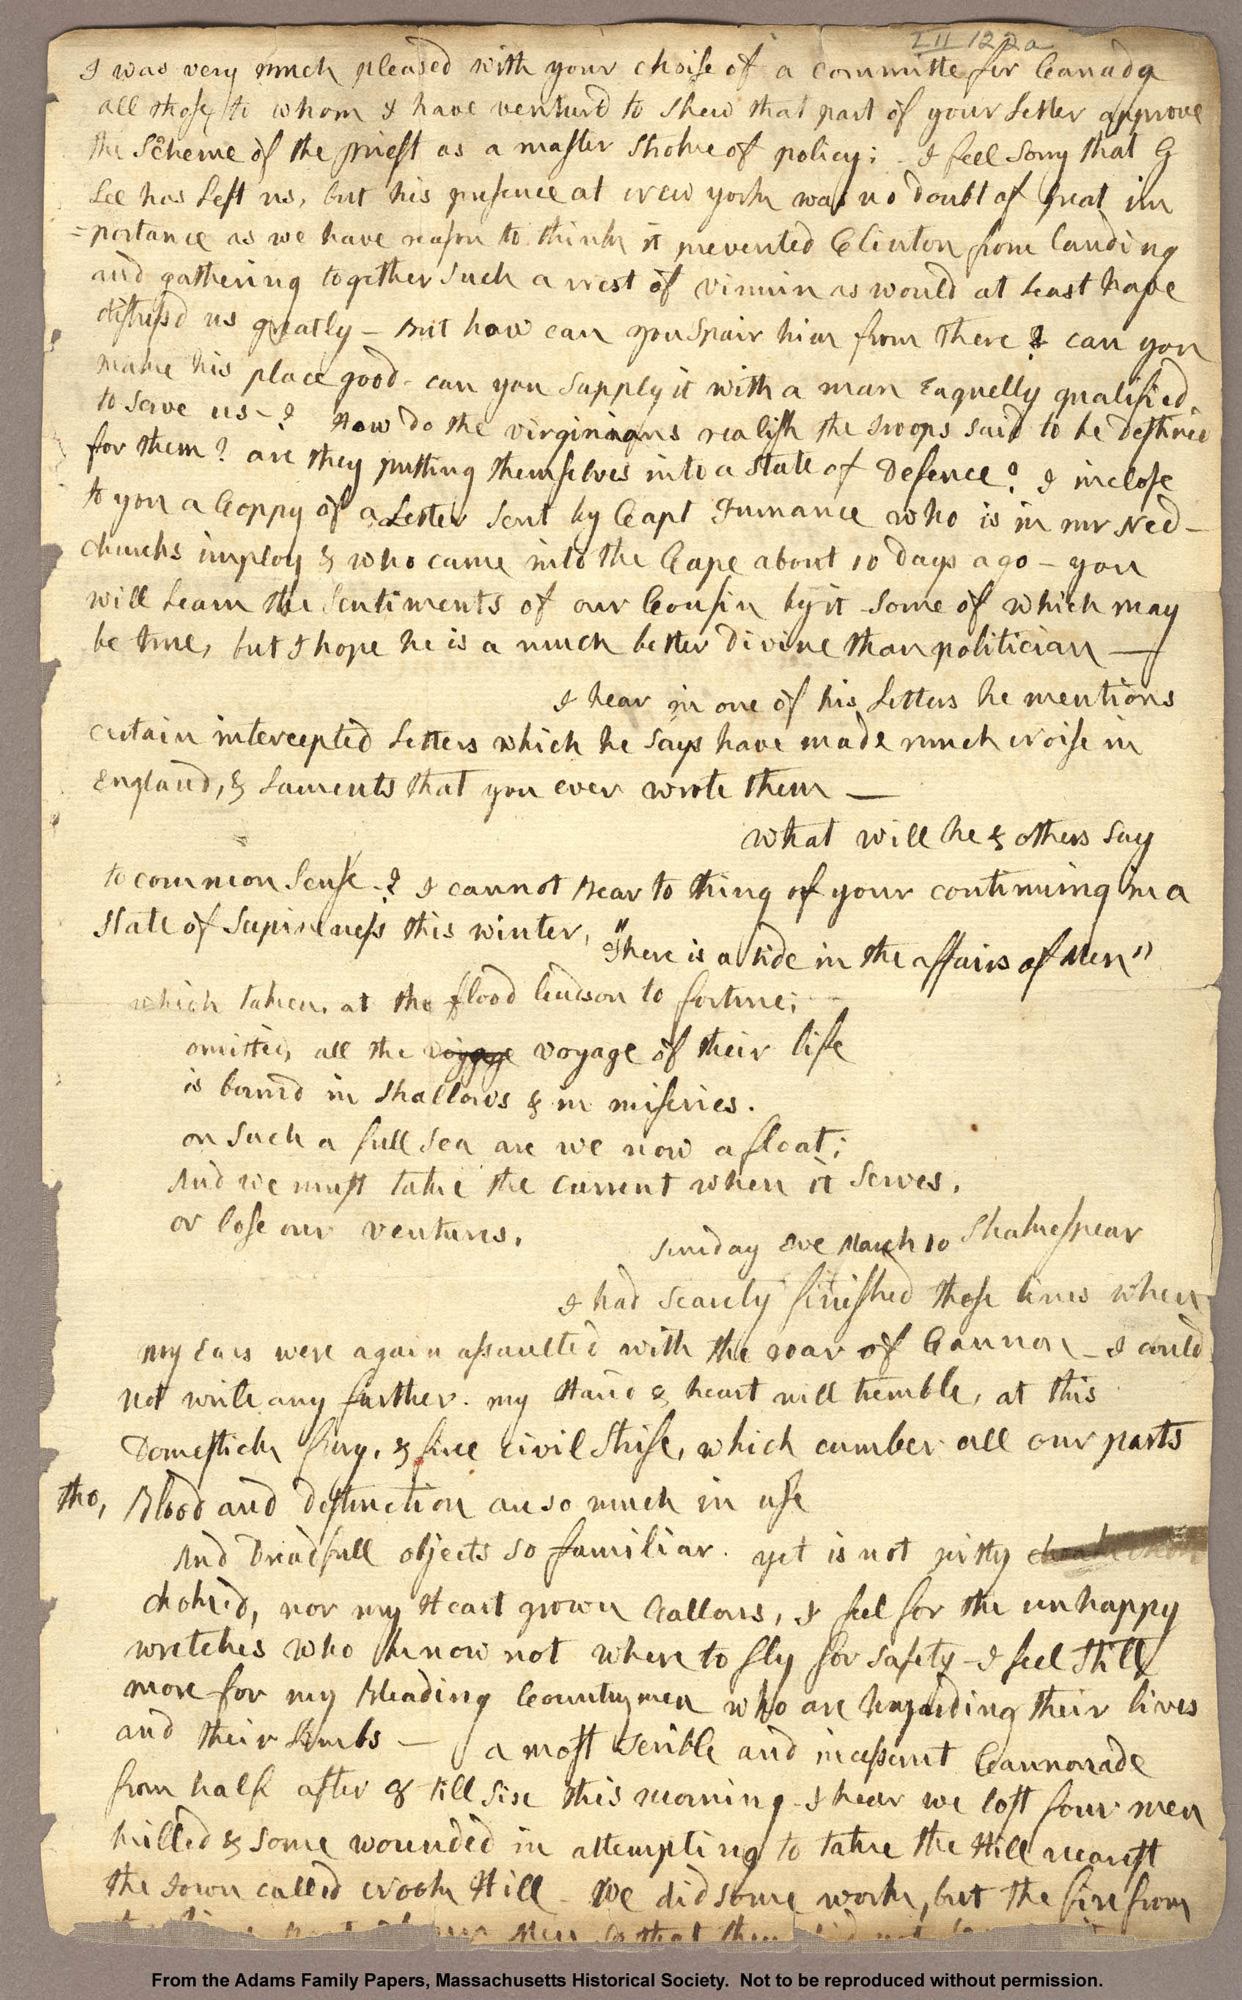 Letter from Abigail Adams to John Adams, 1776, quoting Julius Caesar